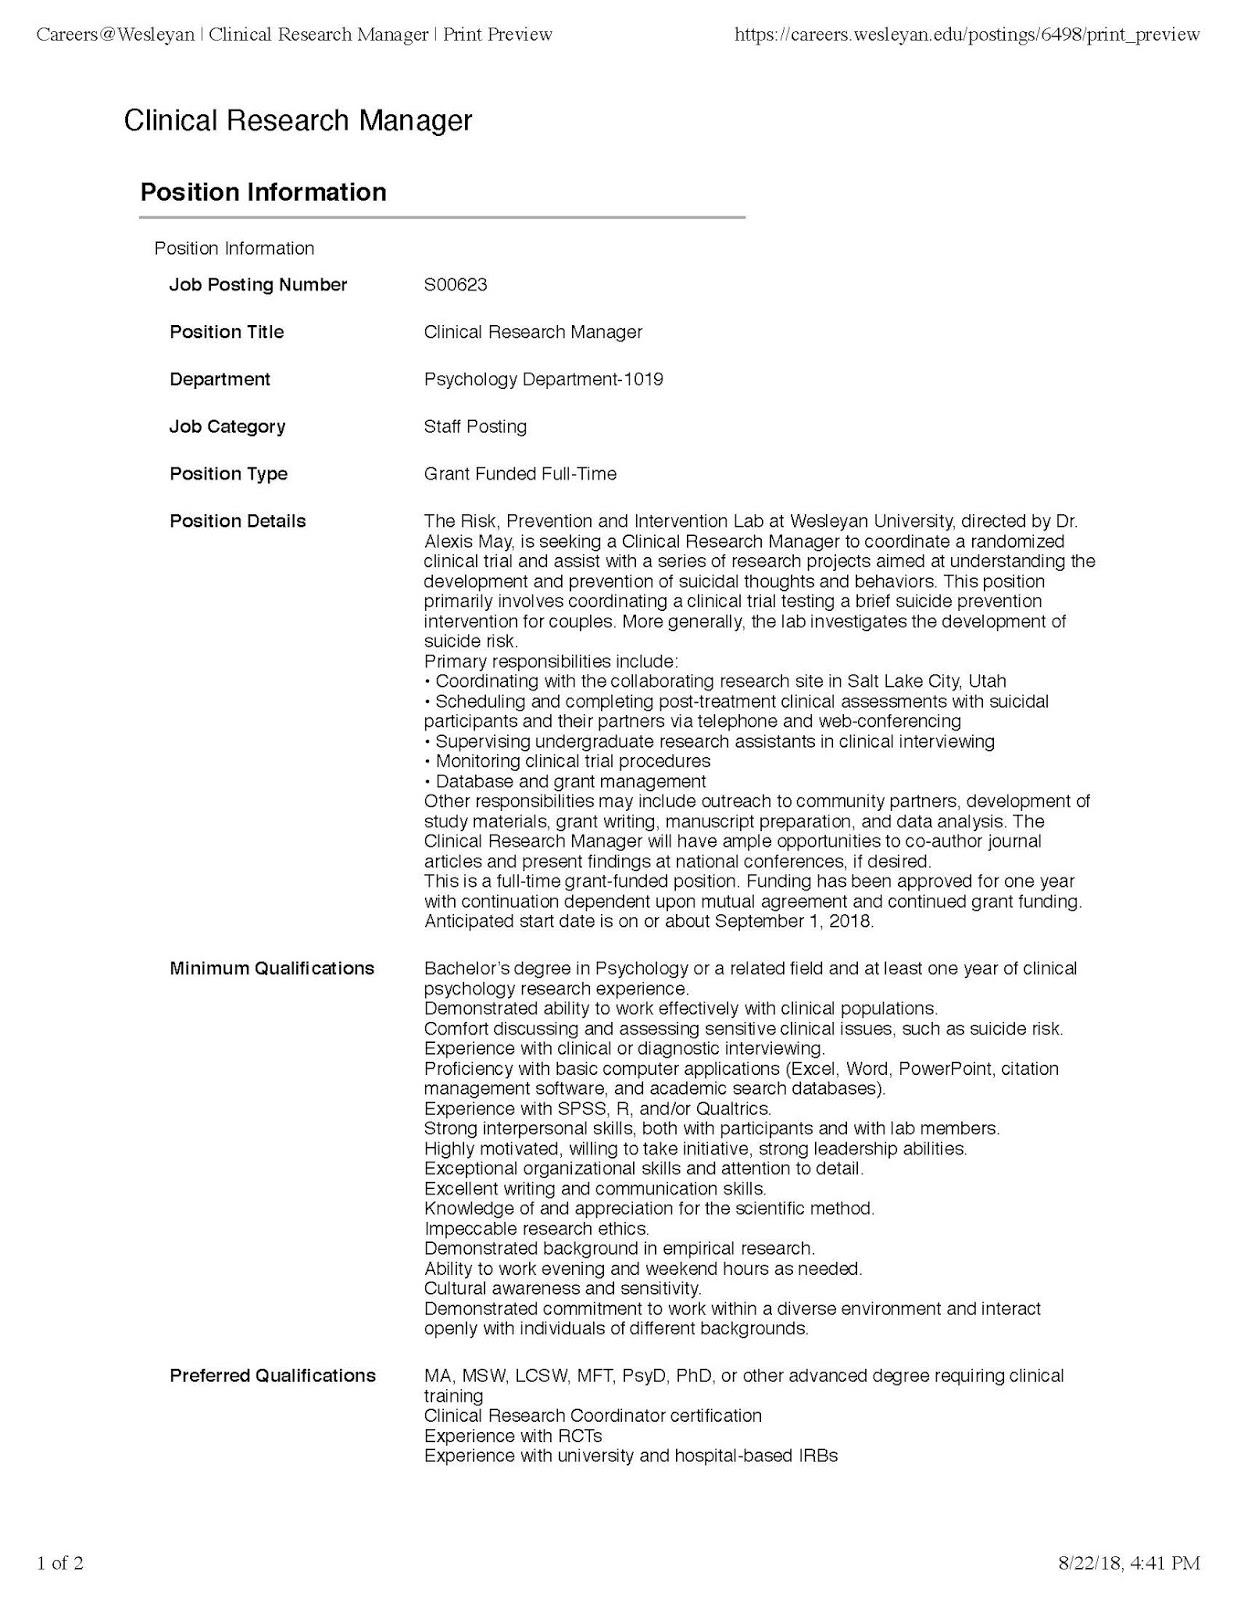 Indiana University Psychology Neuroscience Blog Recruiting For A